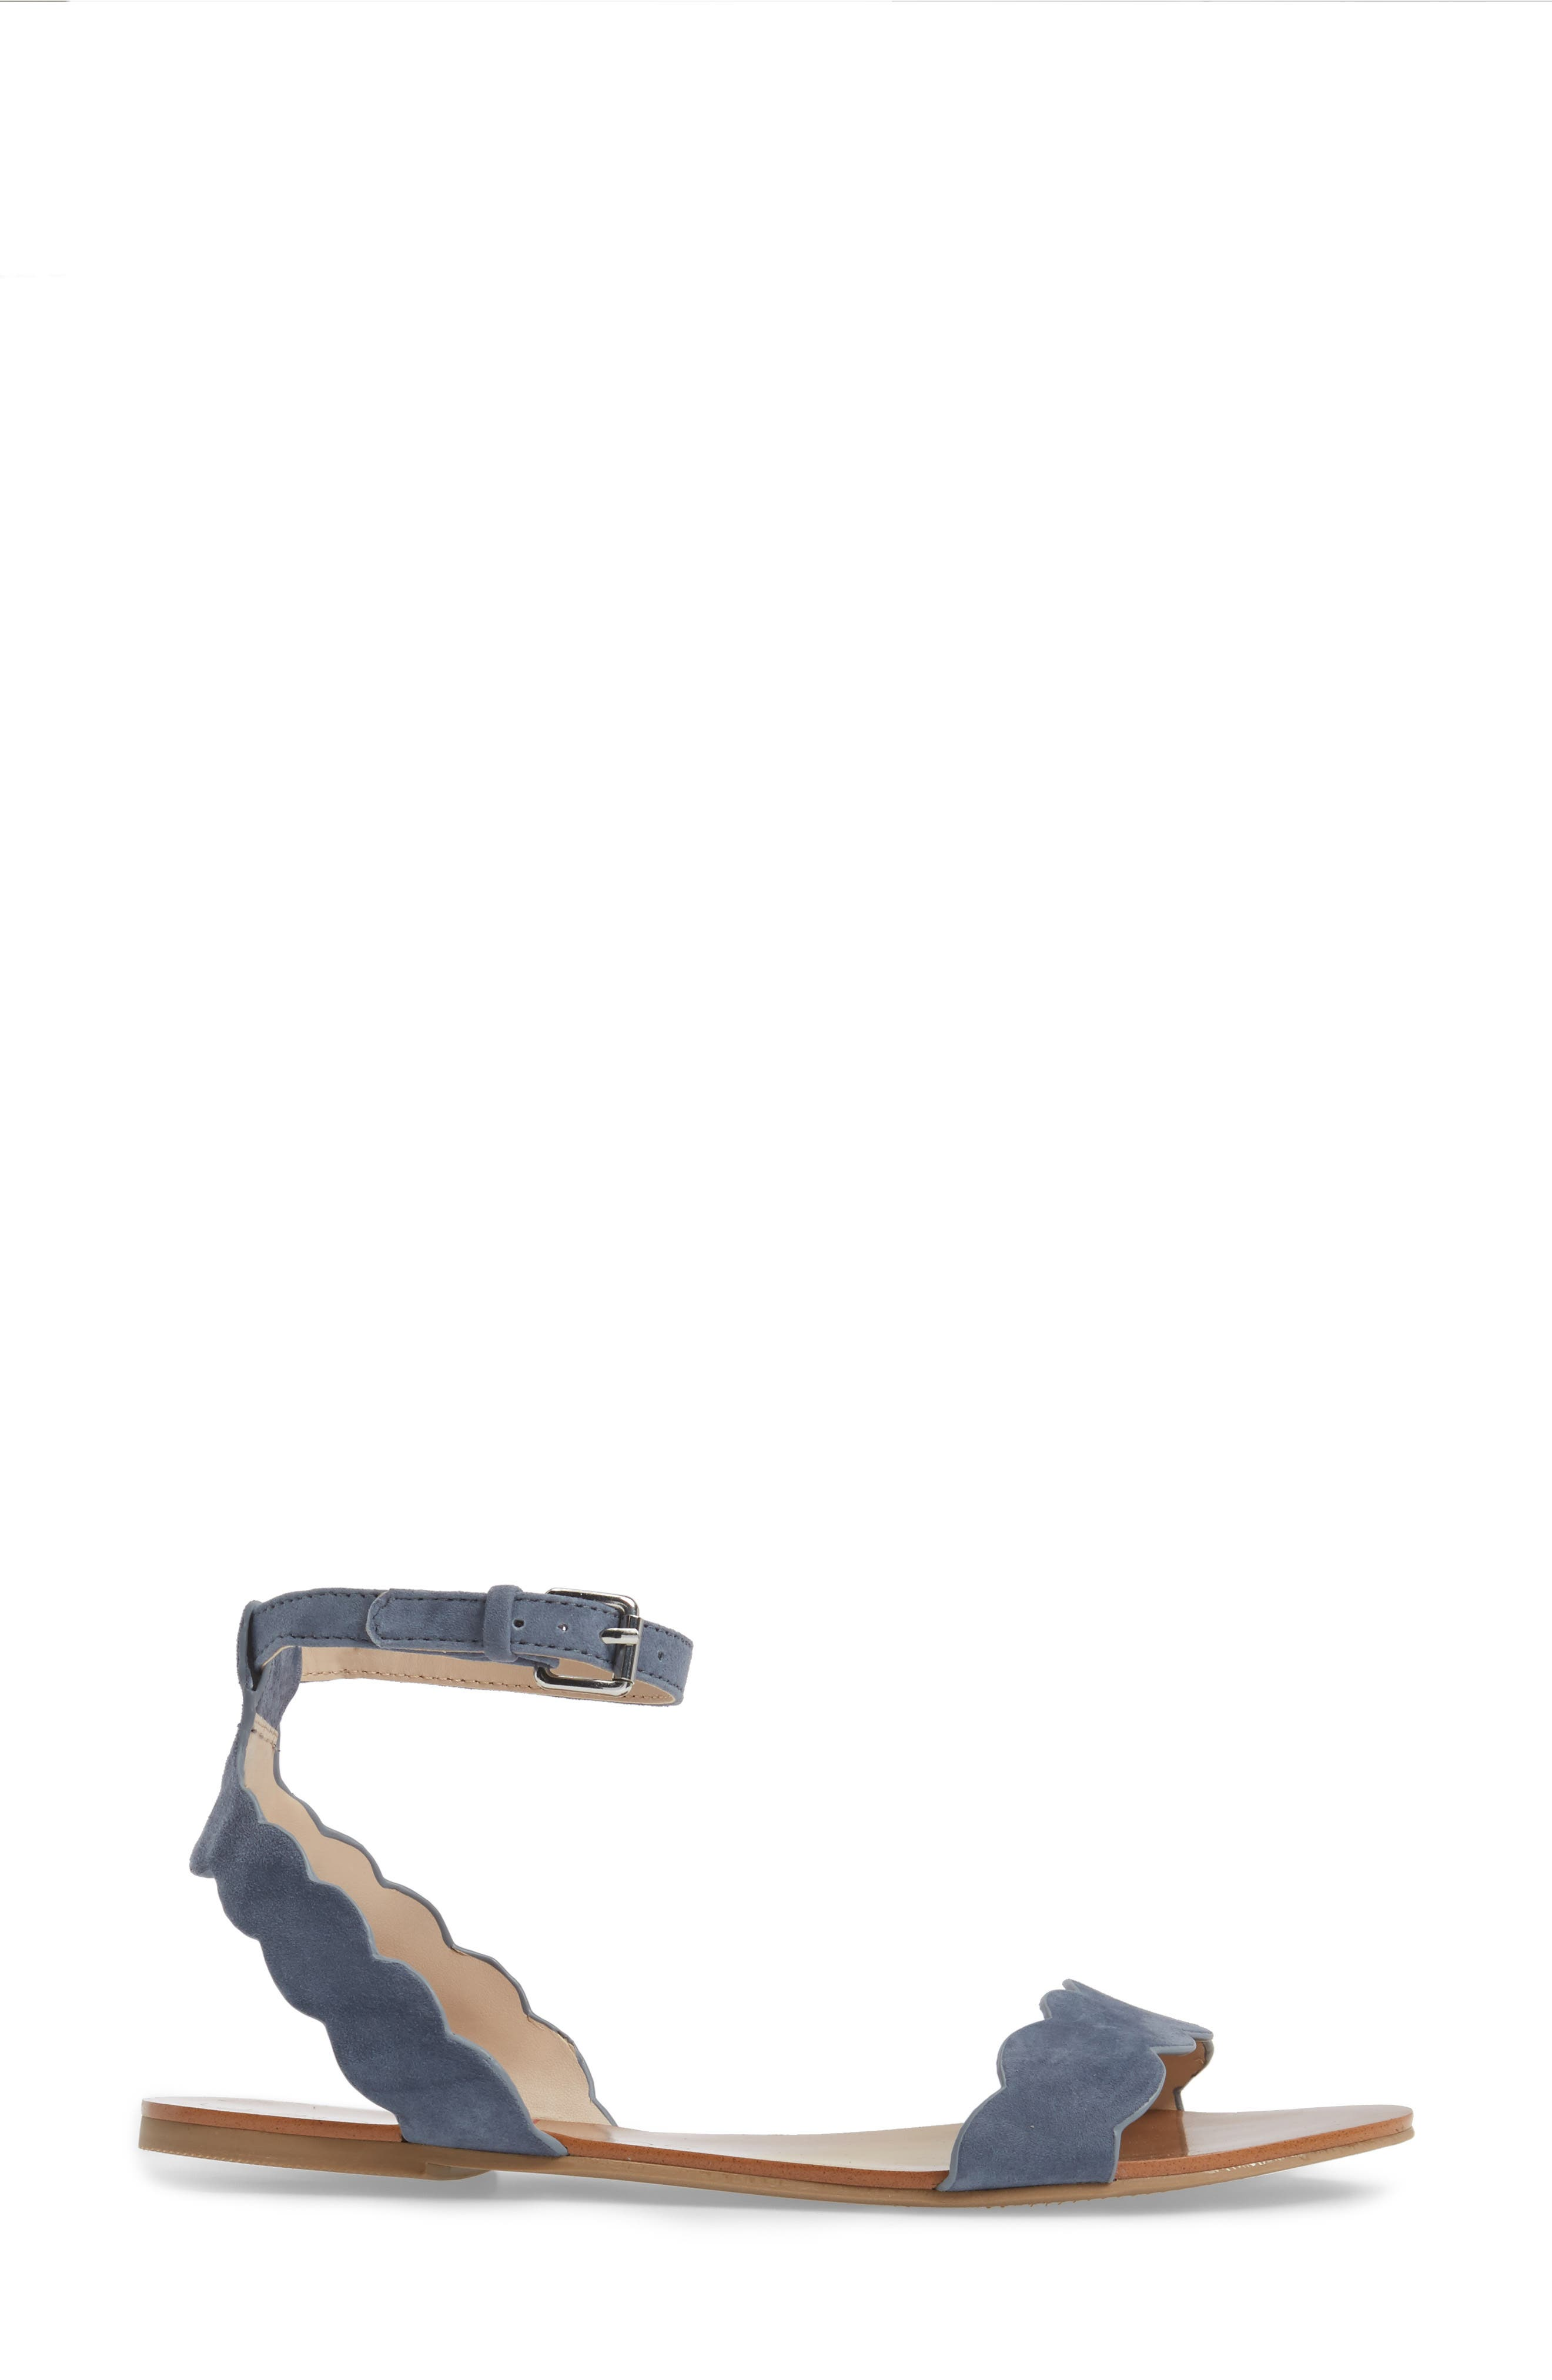 'Odette' Scalloped Ankle Strap Flat Sandal,                             Alternate thumbnail 20, color,